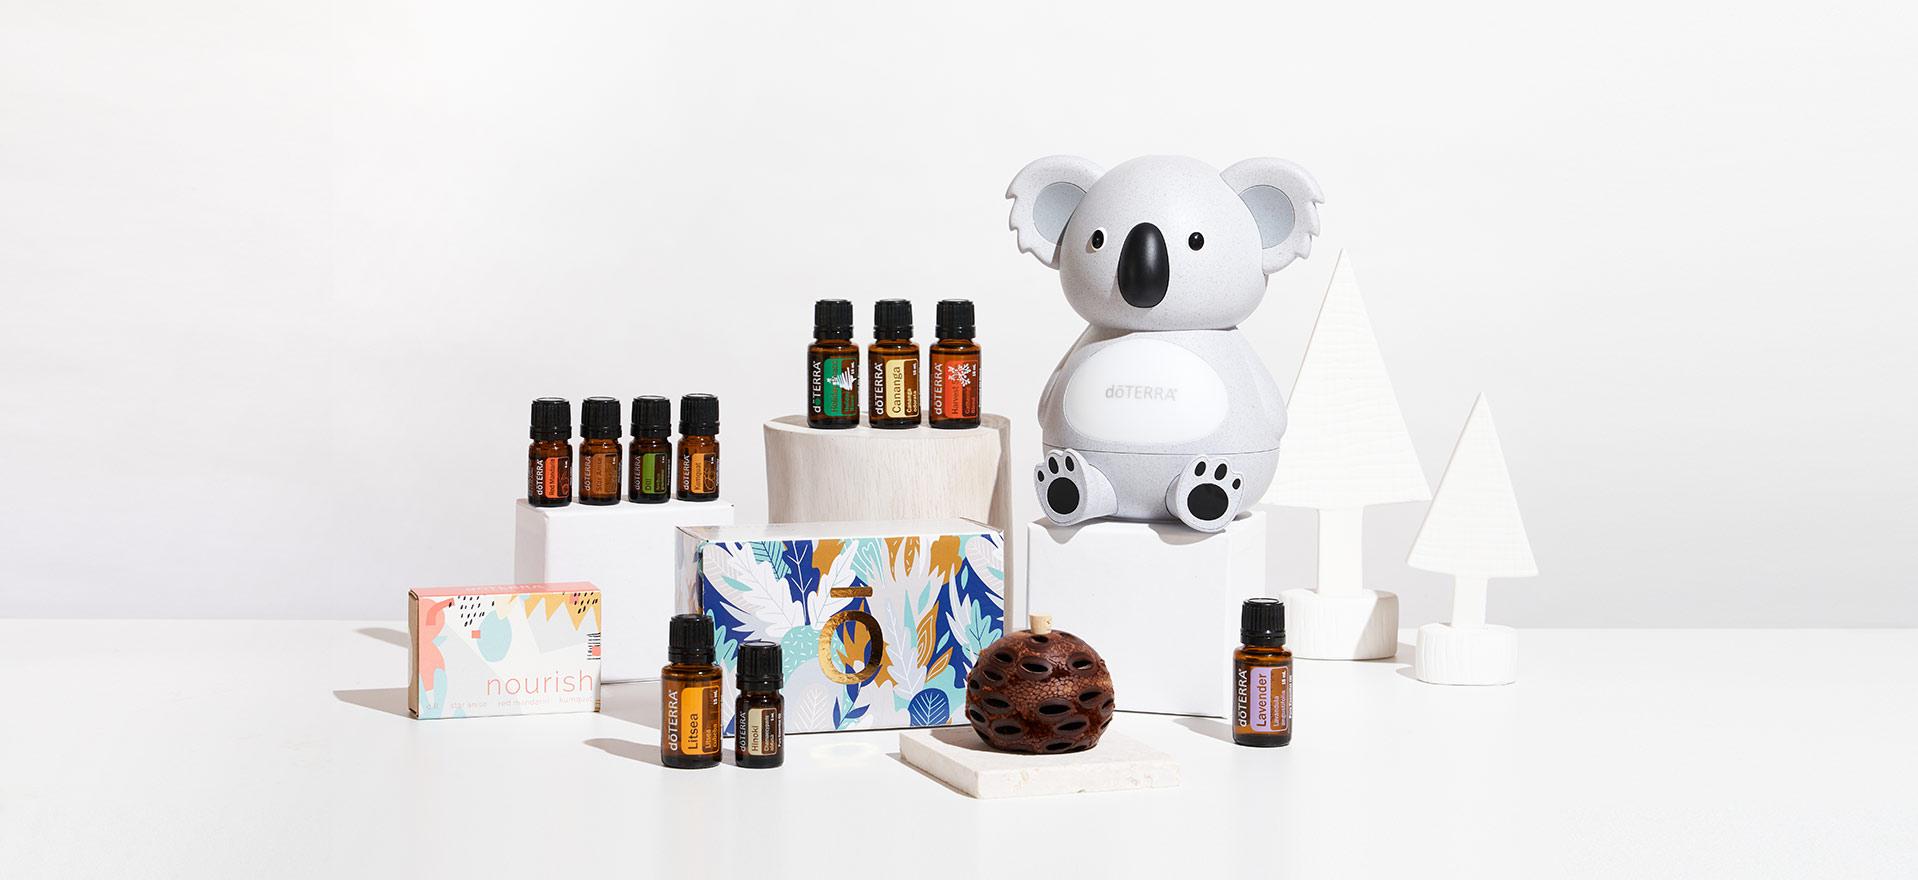 Doterra 2020 Christmas Catalog doTERRA AUNZ Monthly Promotions | dōTERRA Essential Oils